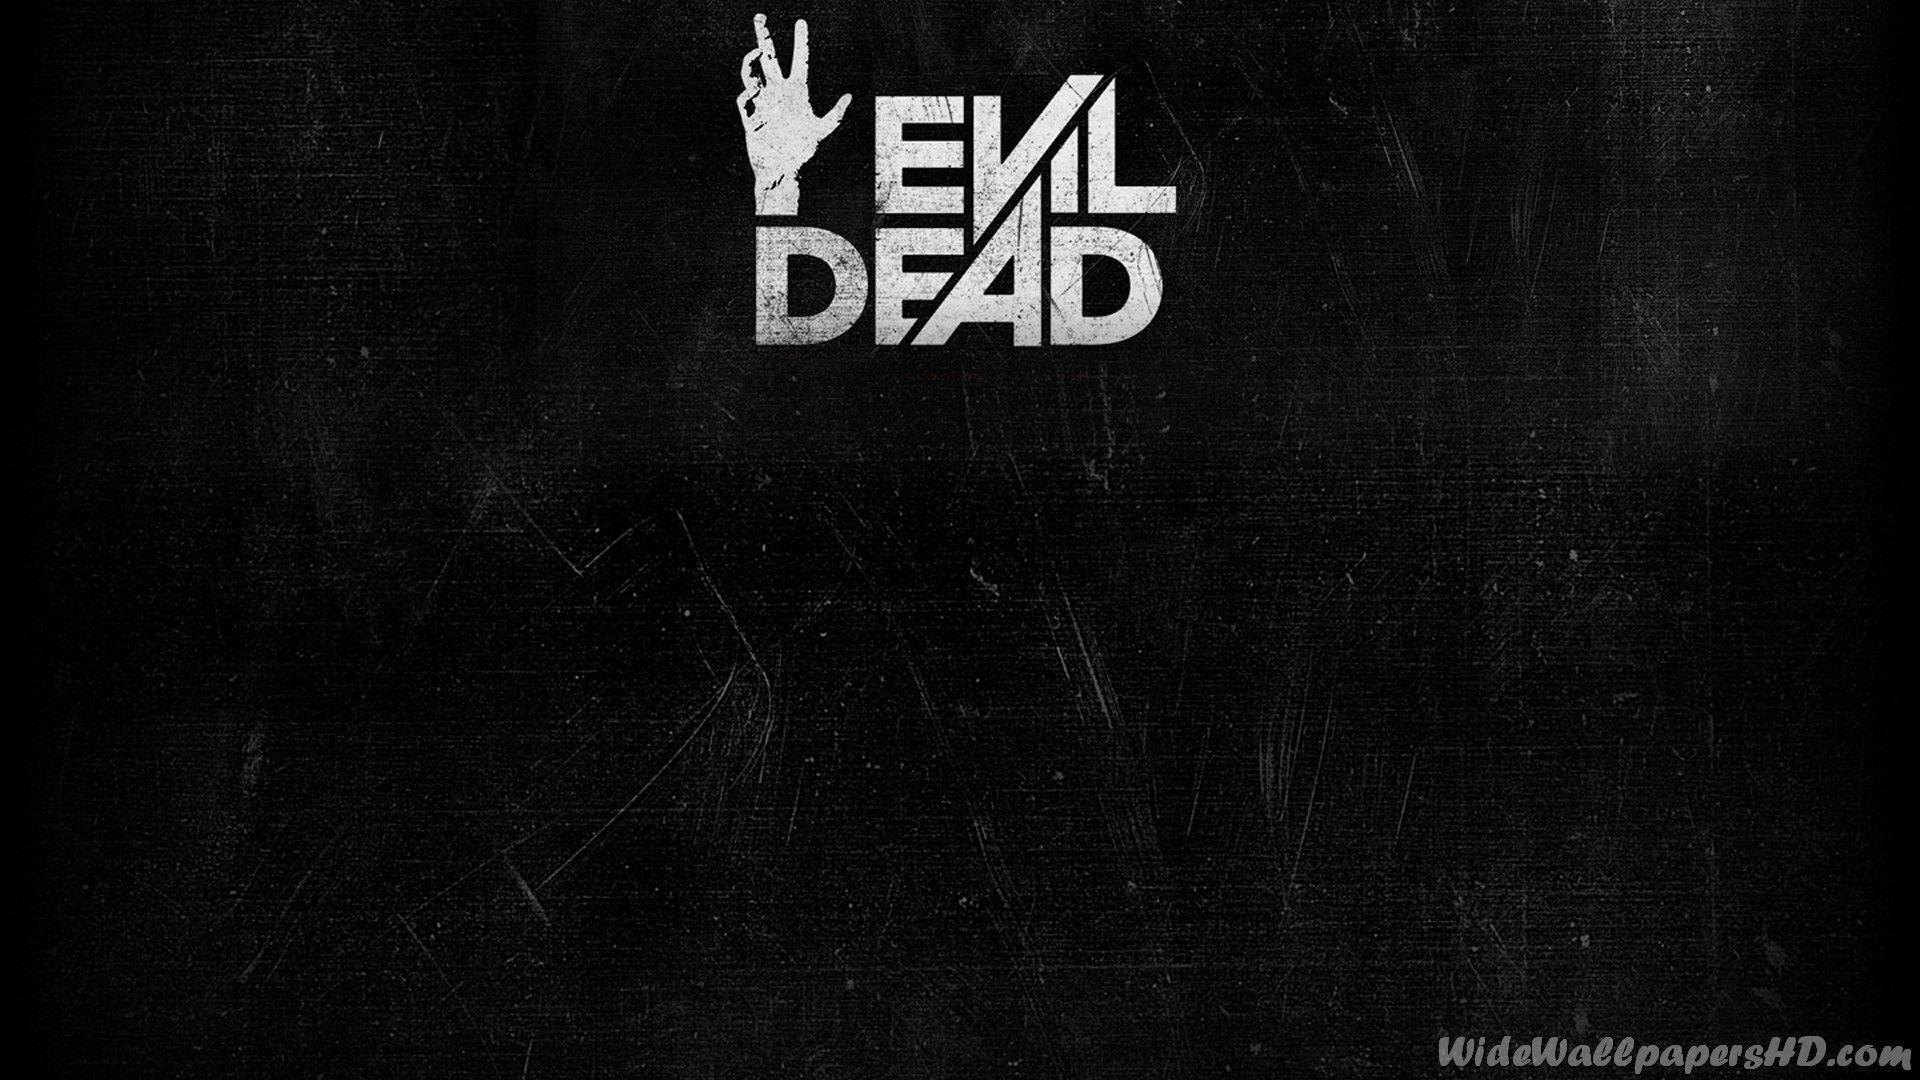 evil dead wallpaper 1920x1080 - photo #35